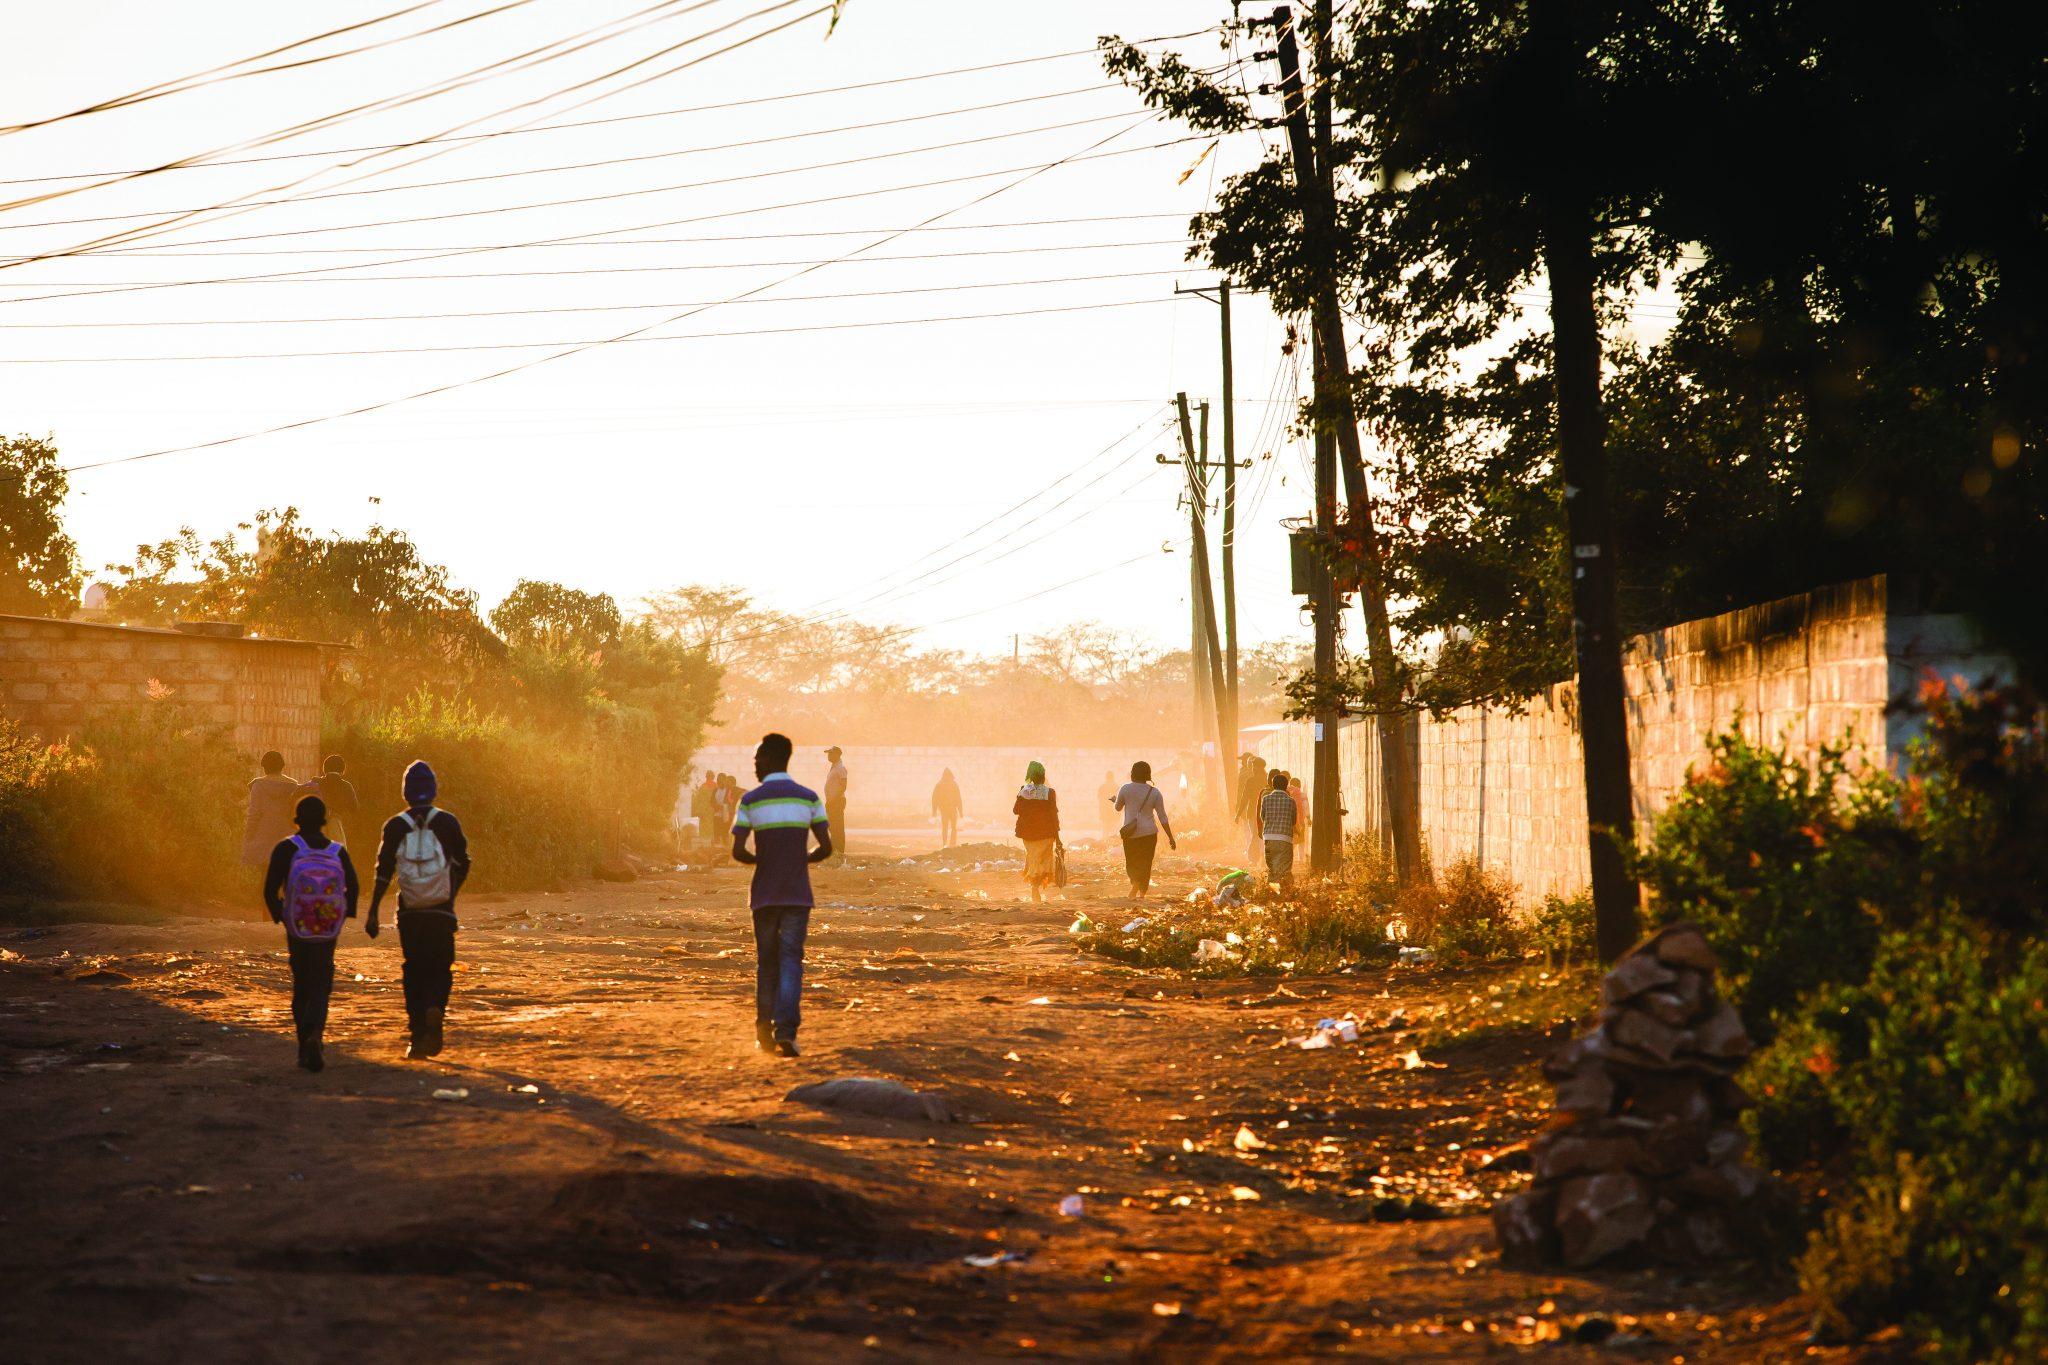 Street scene in Lusaka, Zambia